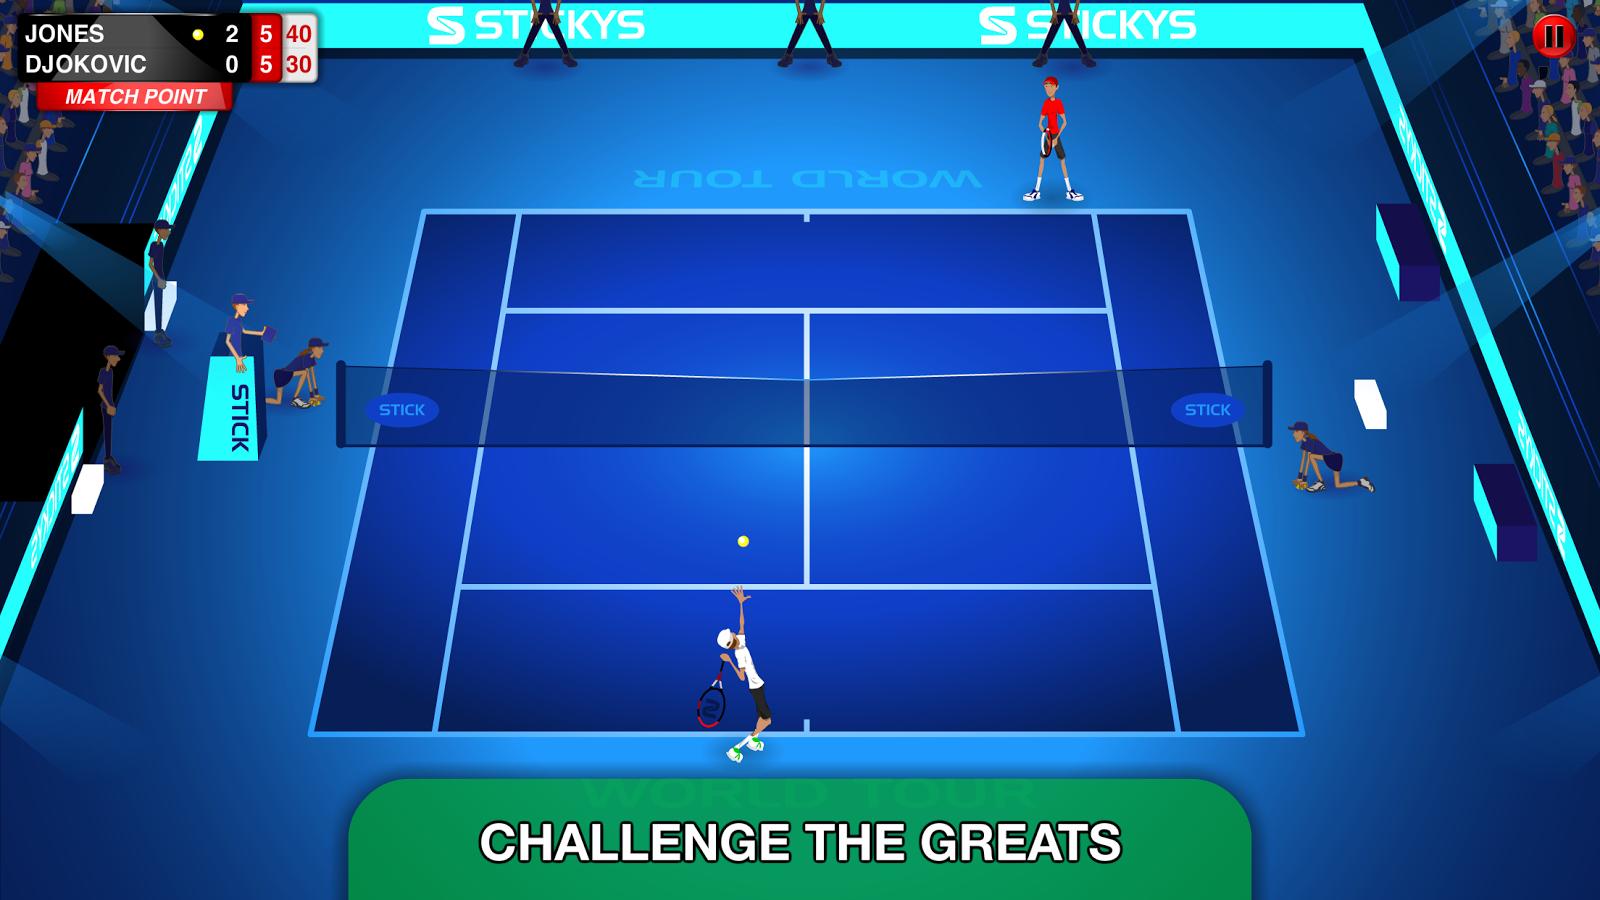 Free Stick Tennis Tour Iphone Game Download